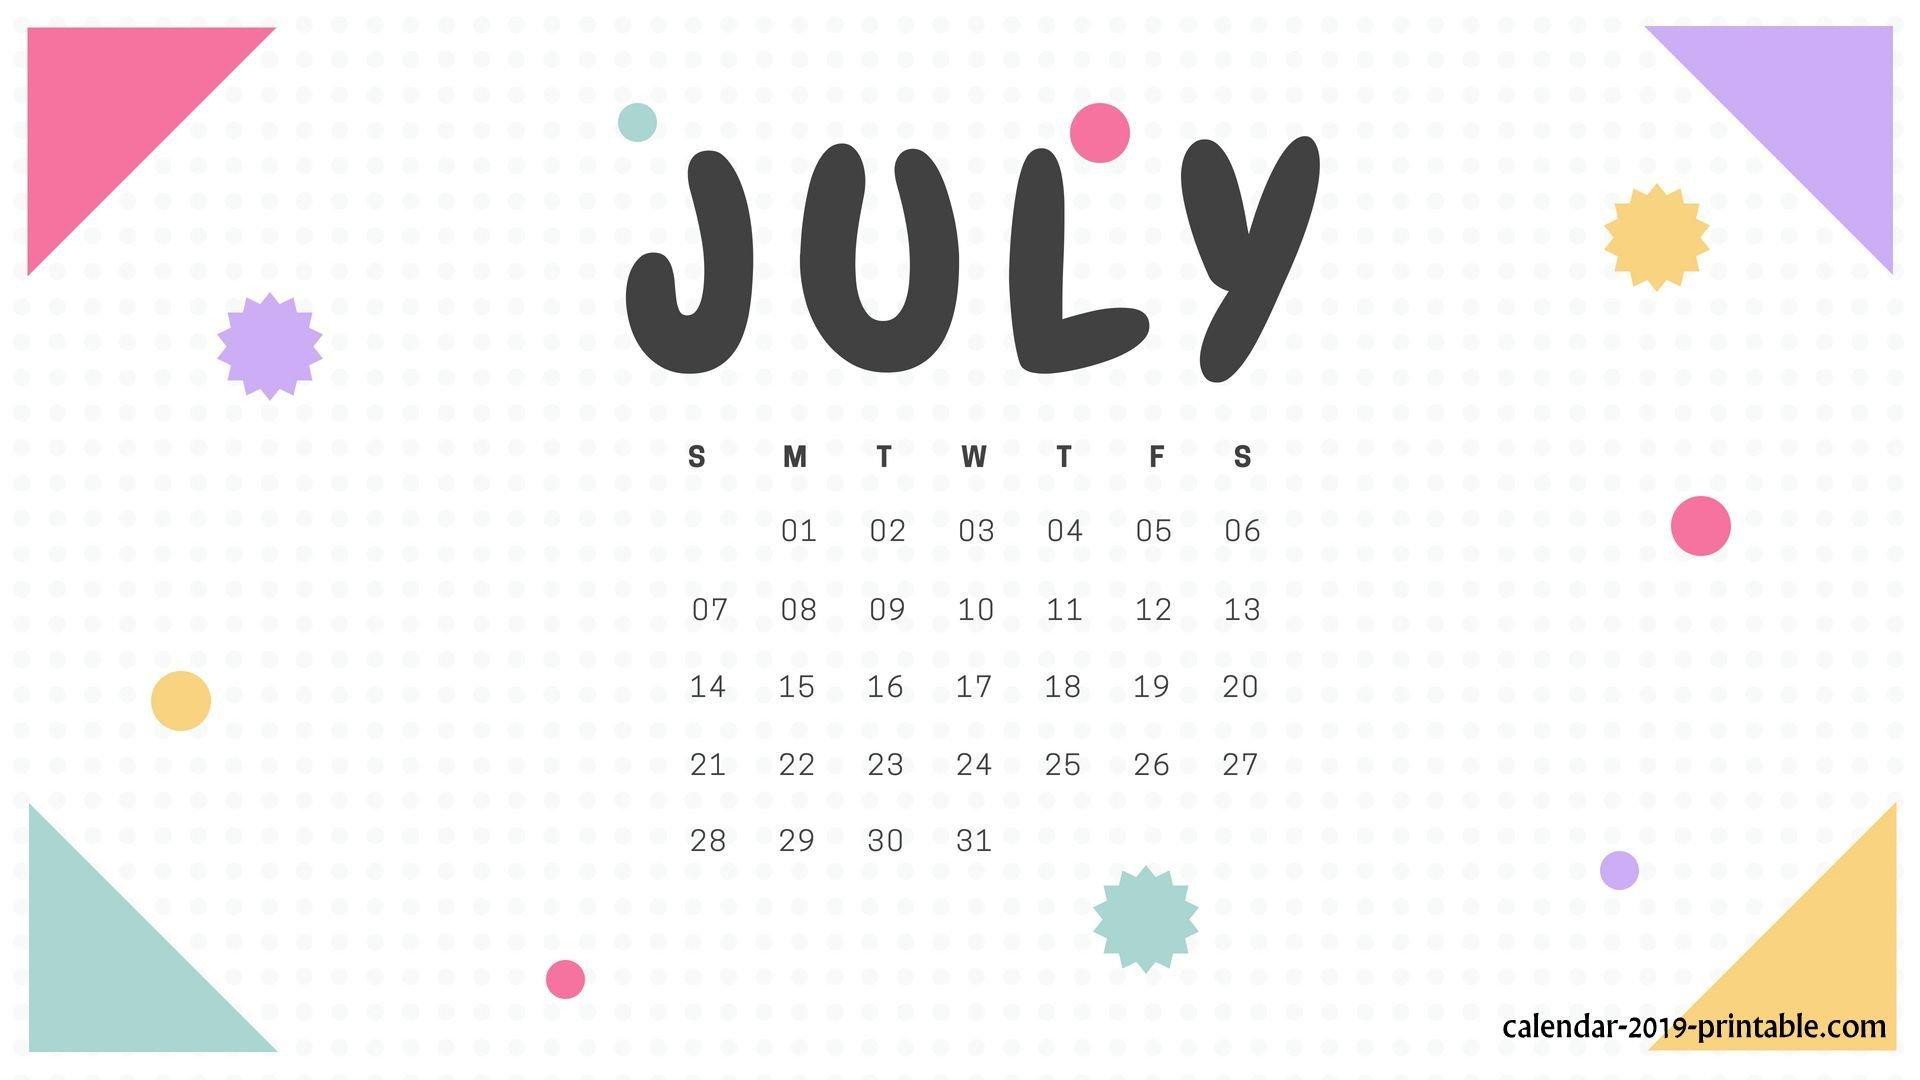 32+] July 2019 Calendar Wallpapers On Wallpapersafari Calendar 2019 Wallpaper